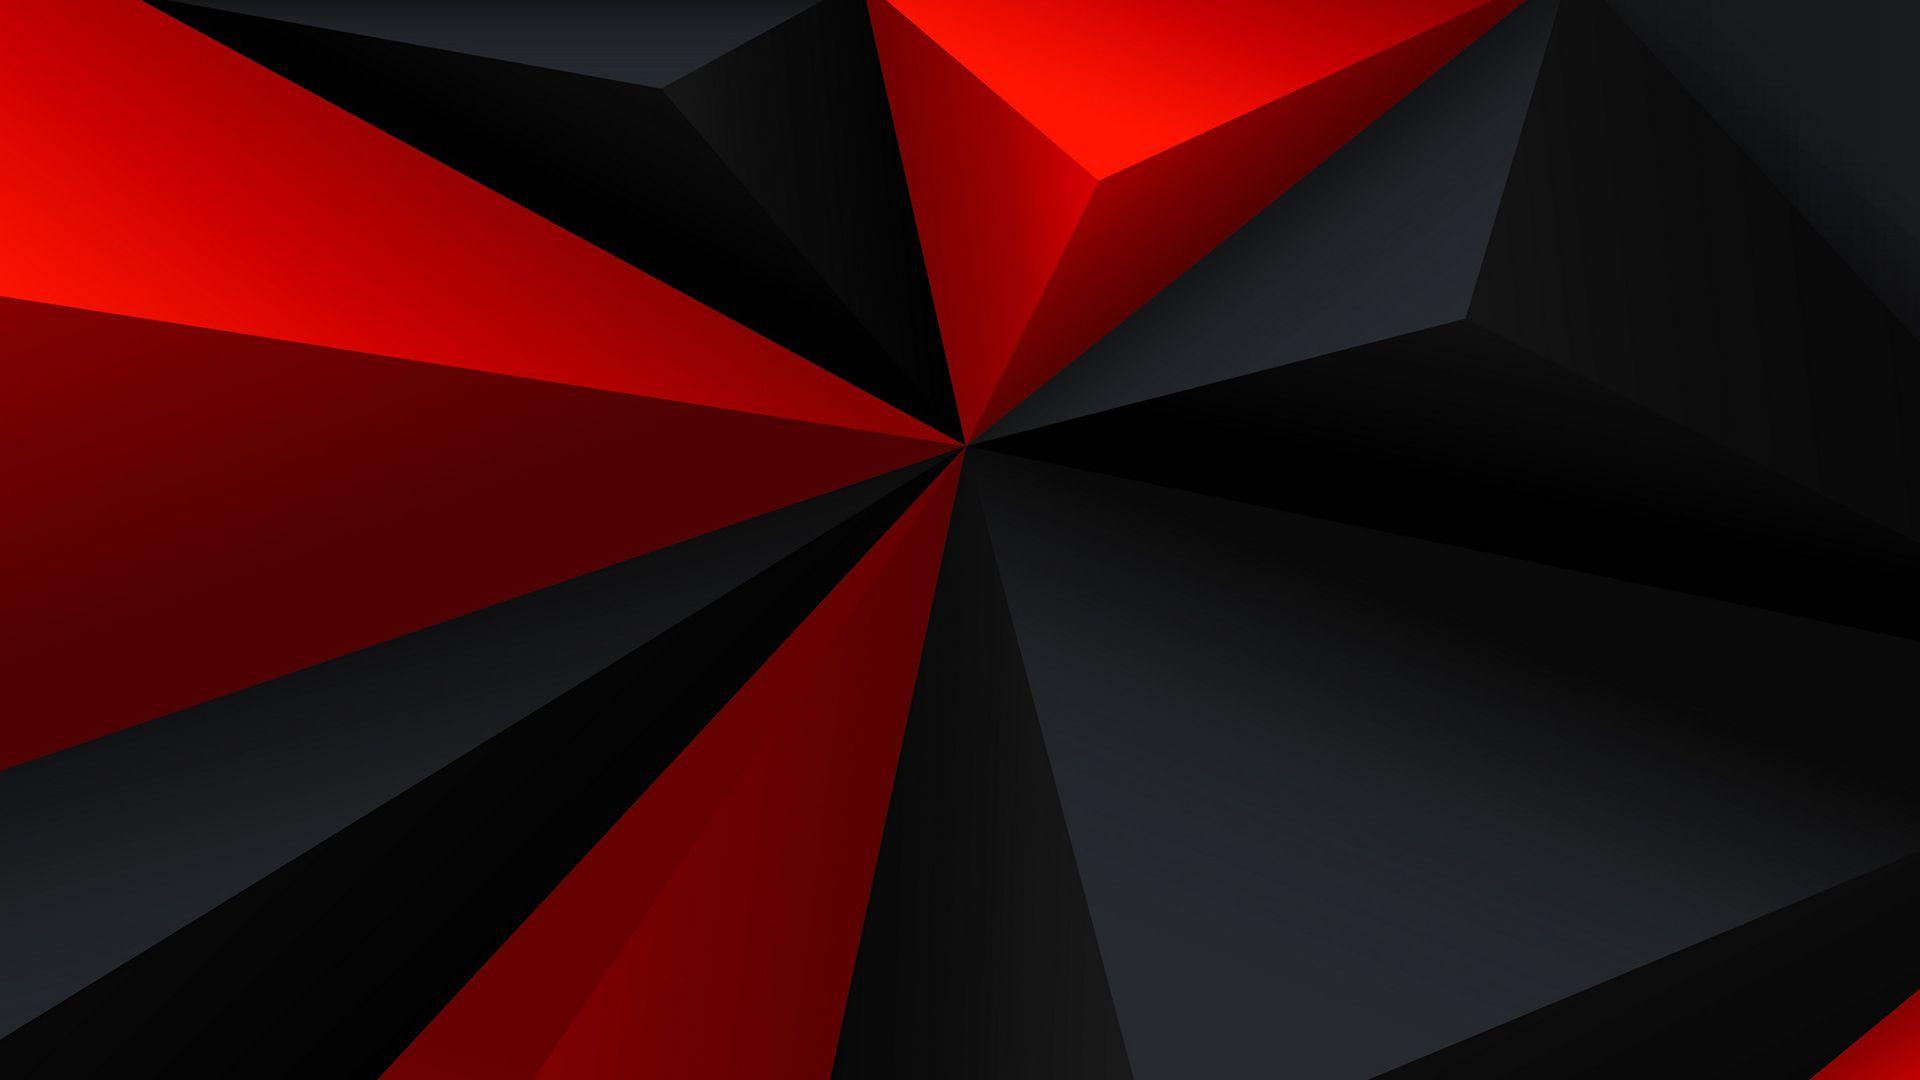 Red Black Wallpaper Images Wallpapers Pinterest